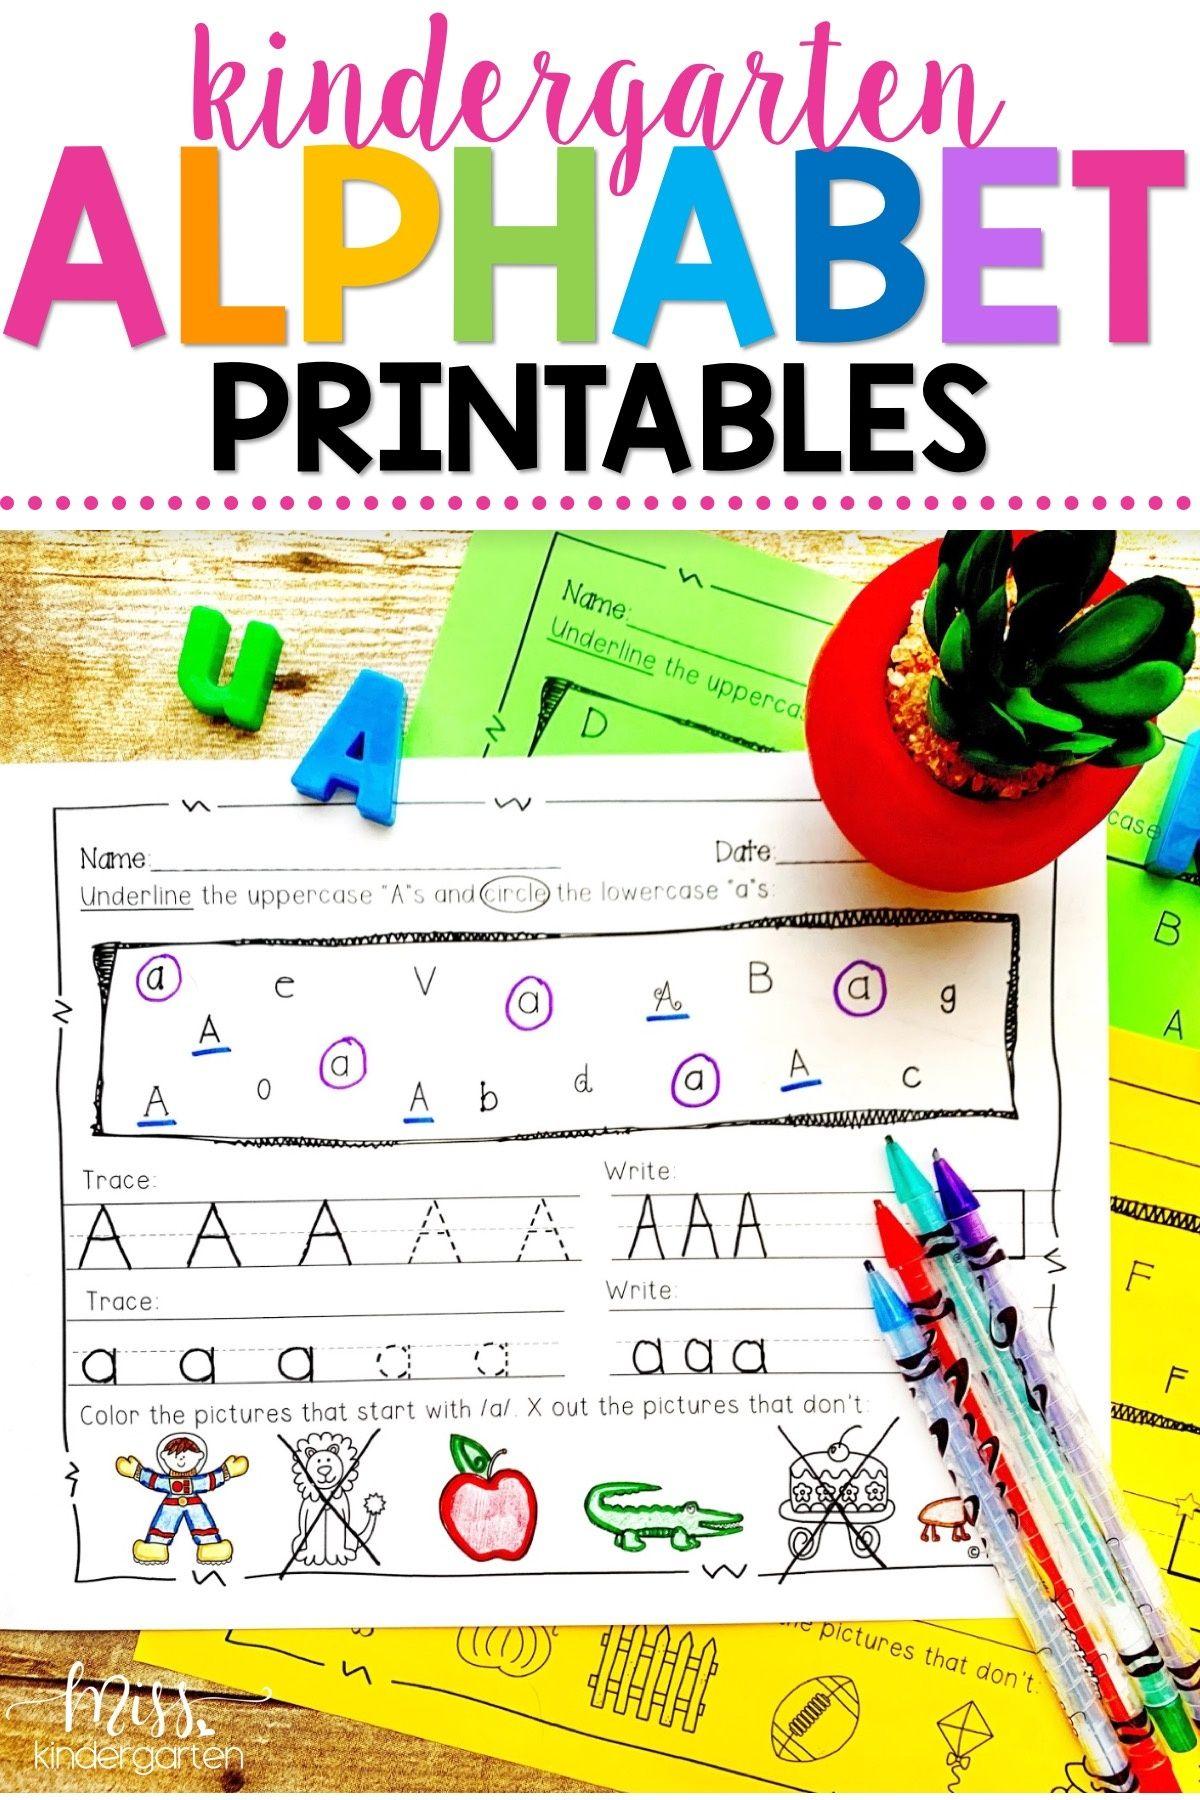 These Fun Printable Alphabet Practice Activities Will Help